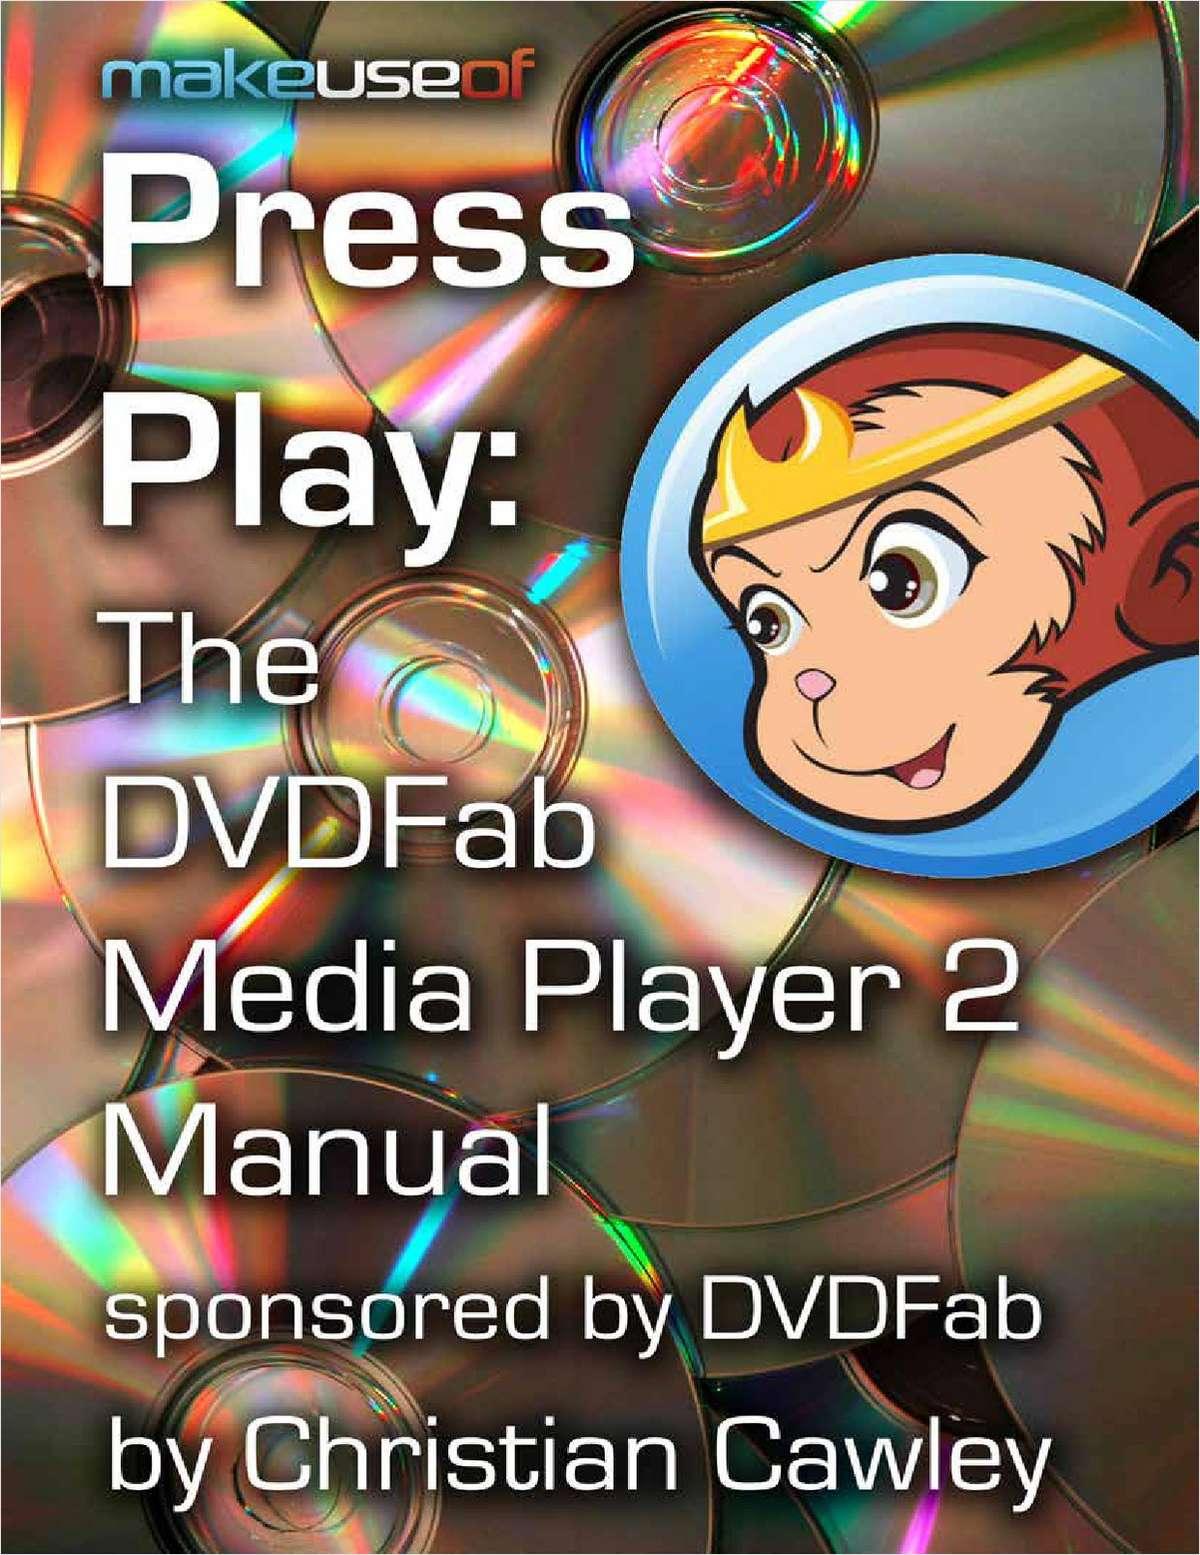 The DVDFab Media Player 2 Manual